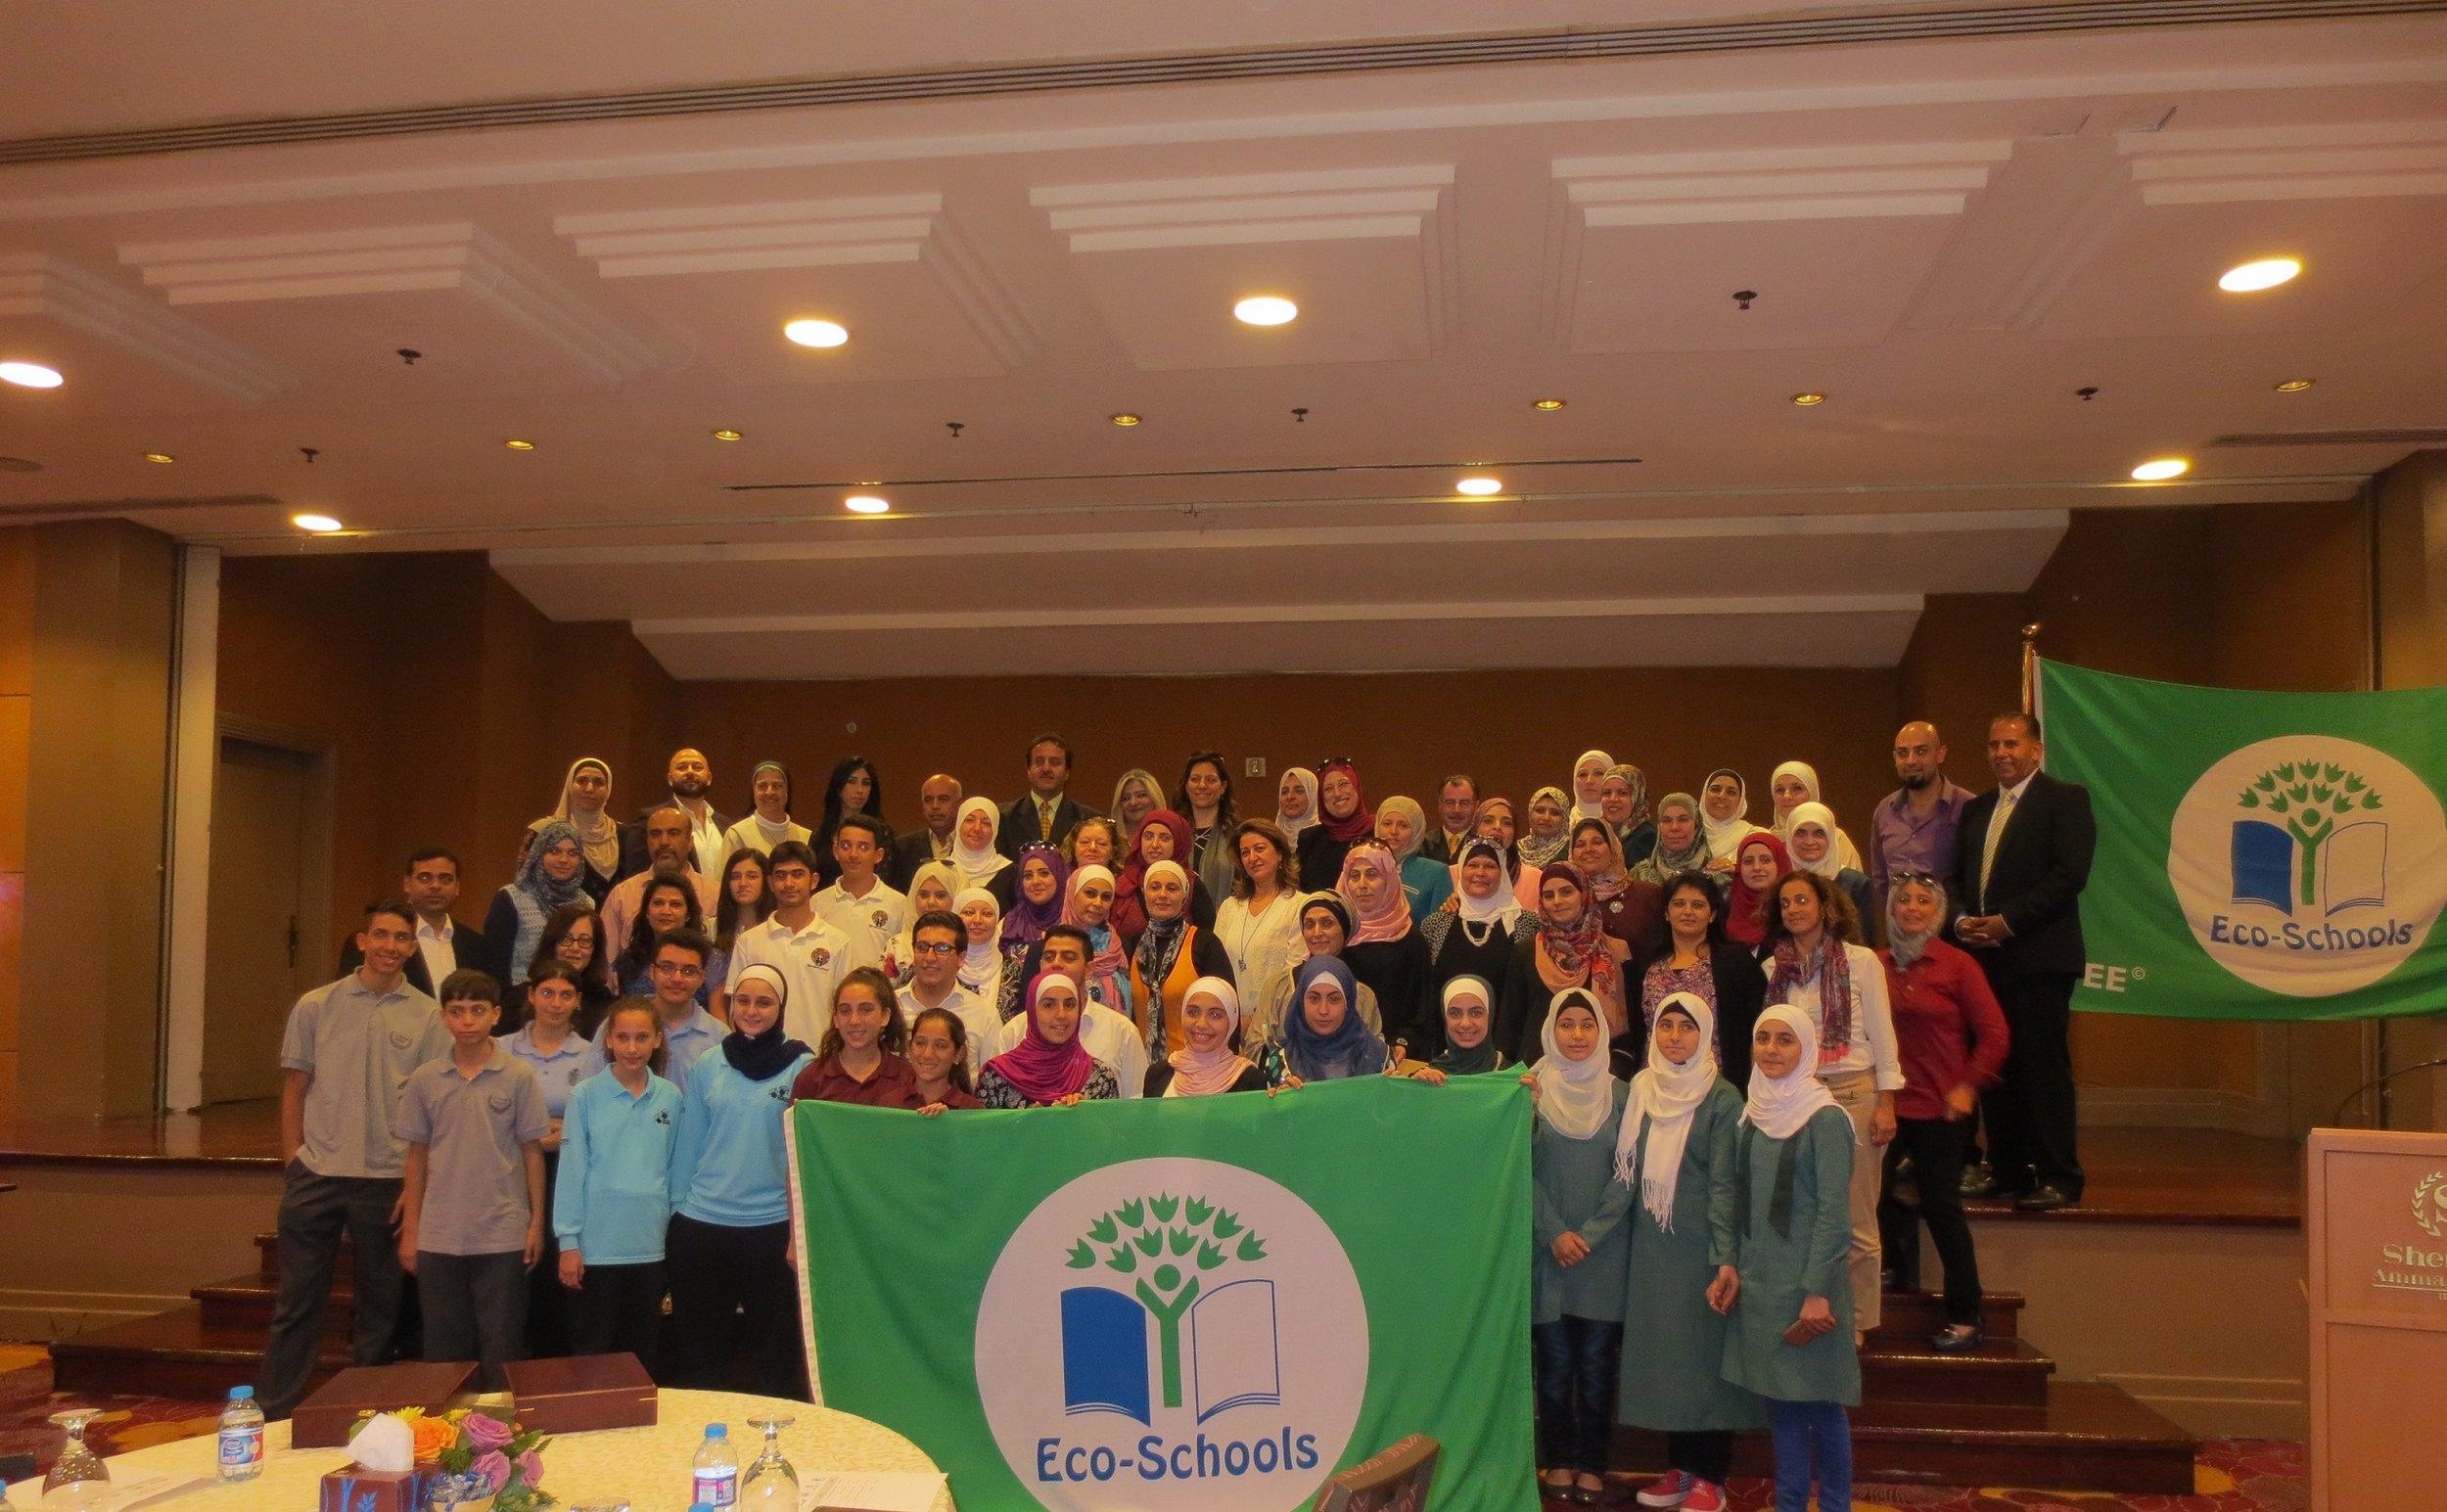 Celebration_ Amman eco-schools.jpg